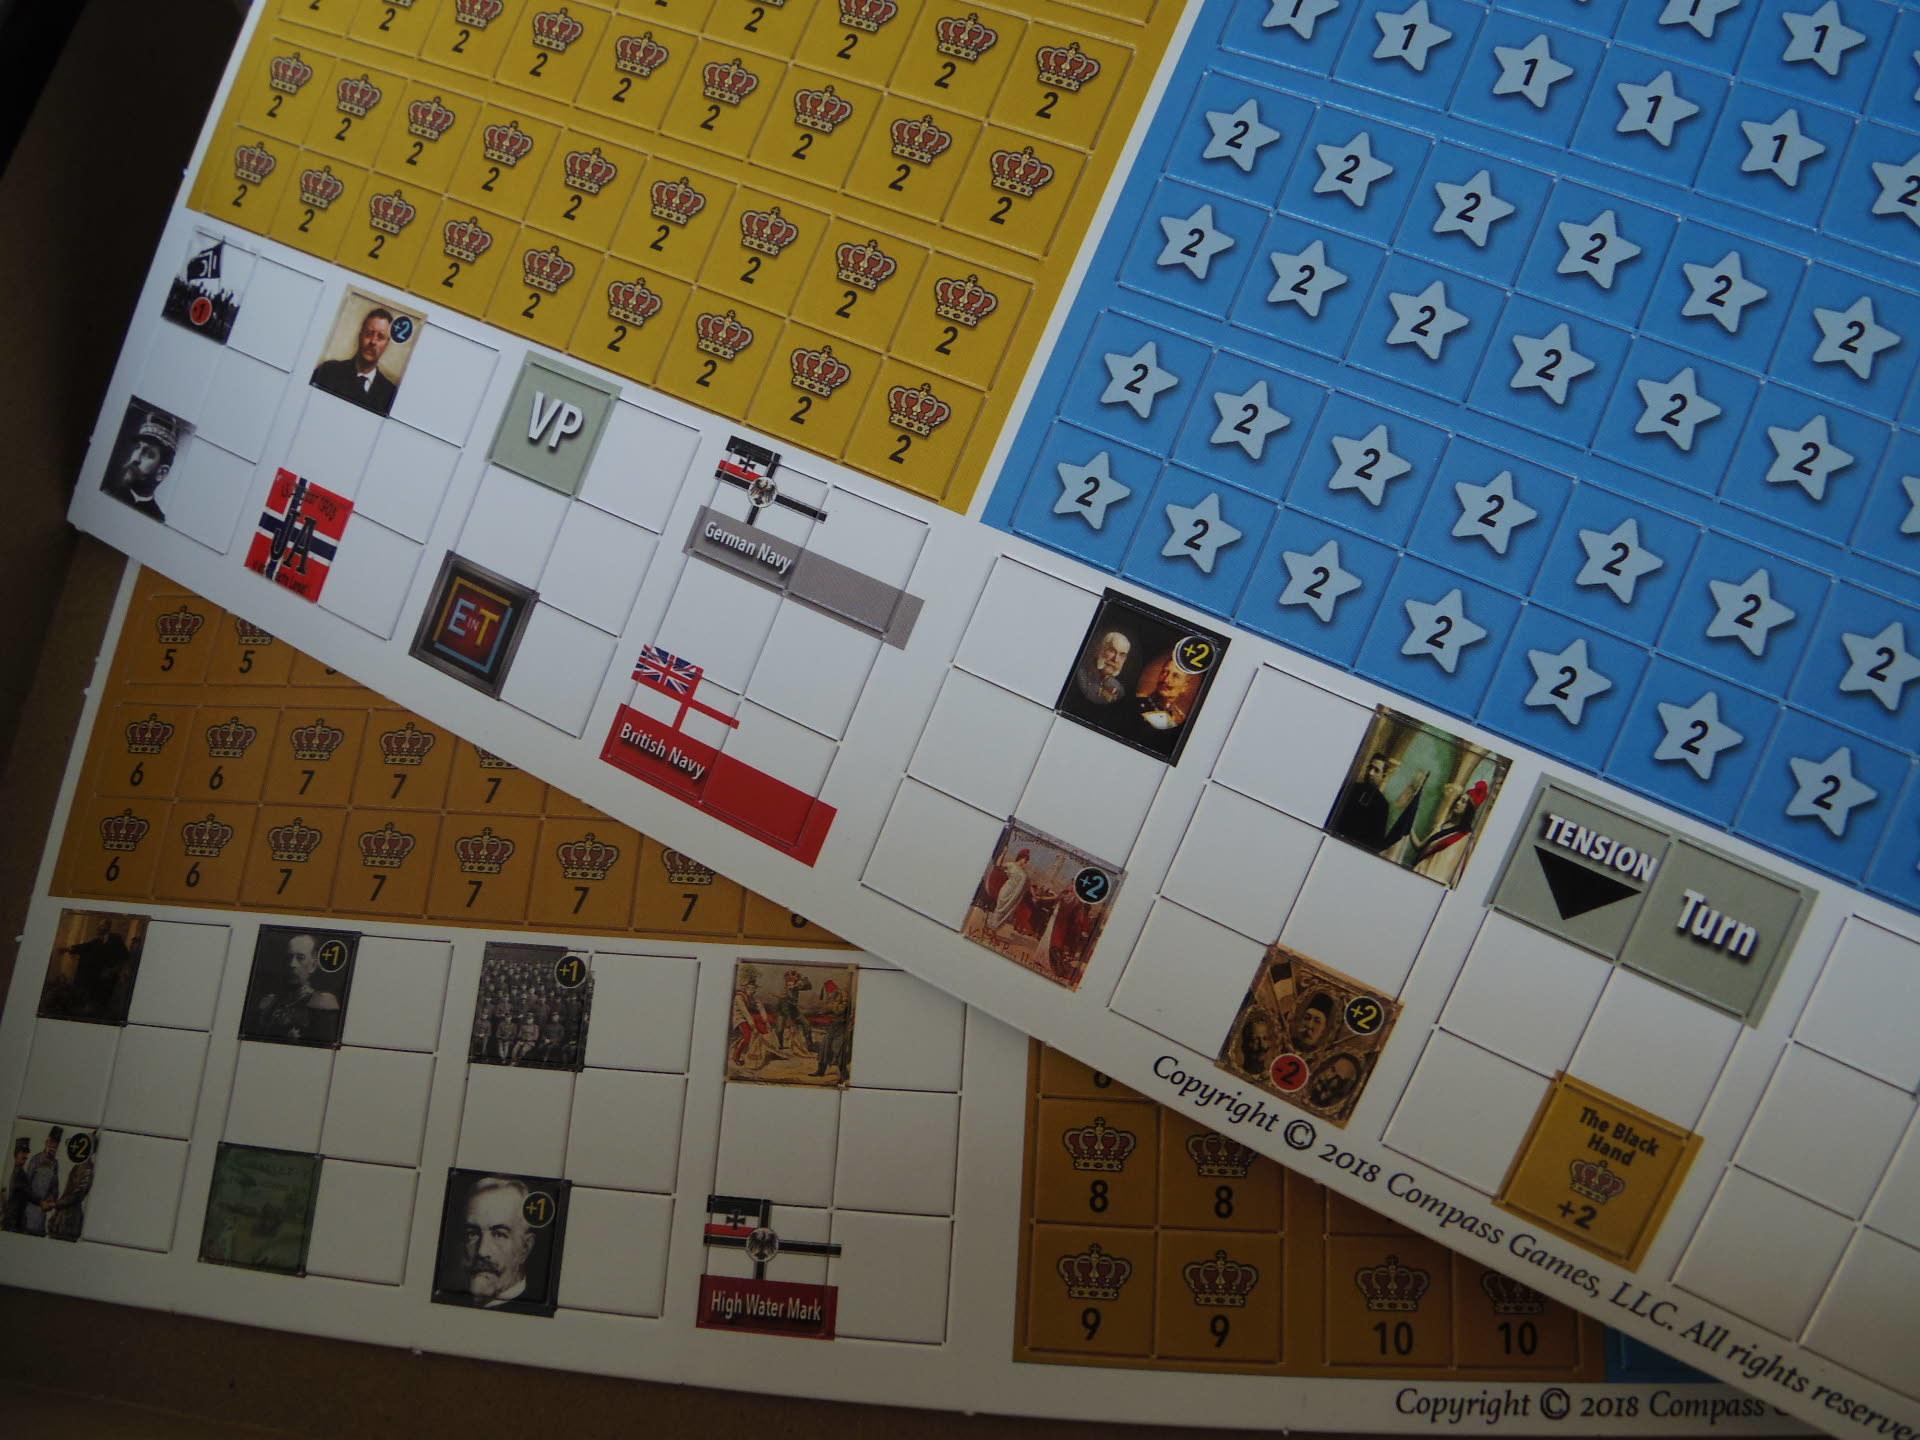 (Compass)Europe In Turmoil: Prelude To The Great War...かつてのウォーゲーム・ブーム期を上回る勢いで続々と出版される最新ゲームたち①_b0173672_22161352.jpg